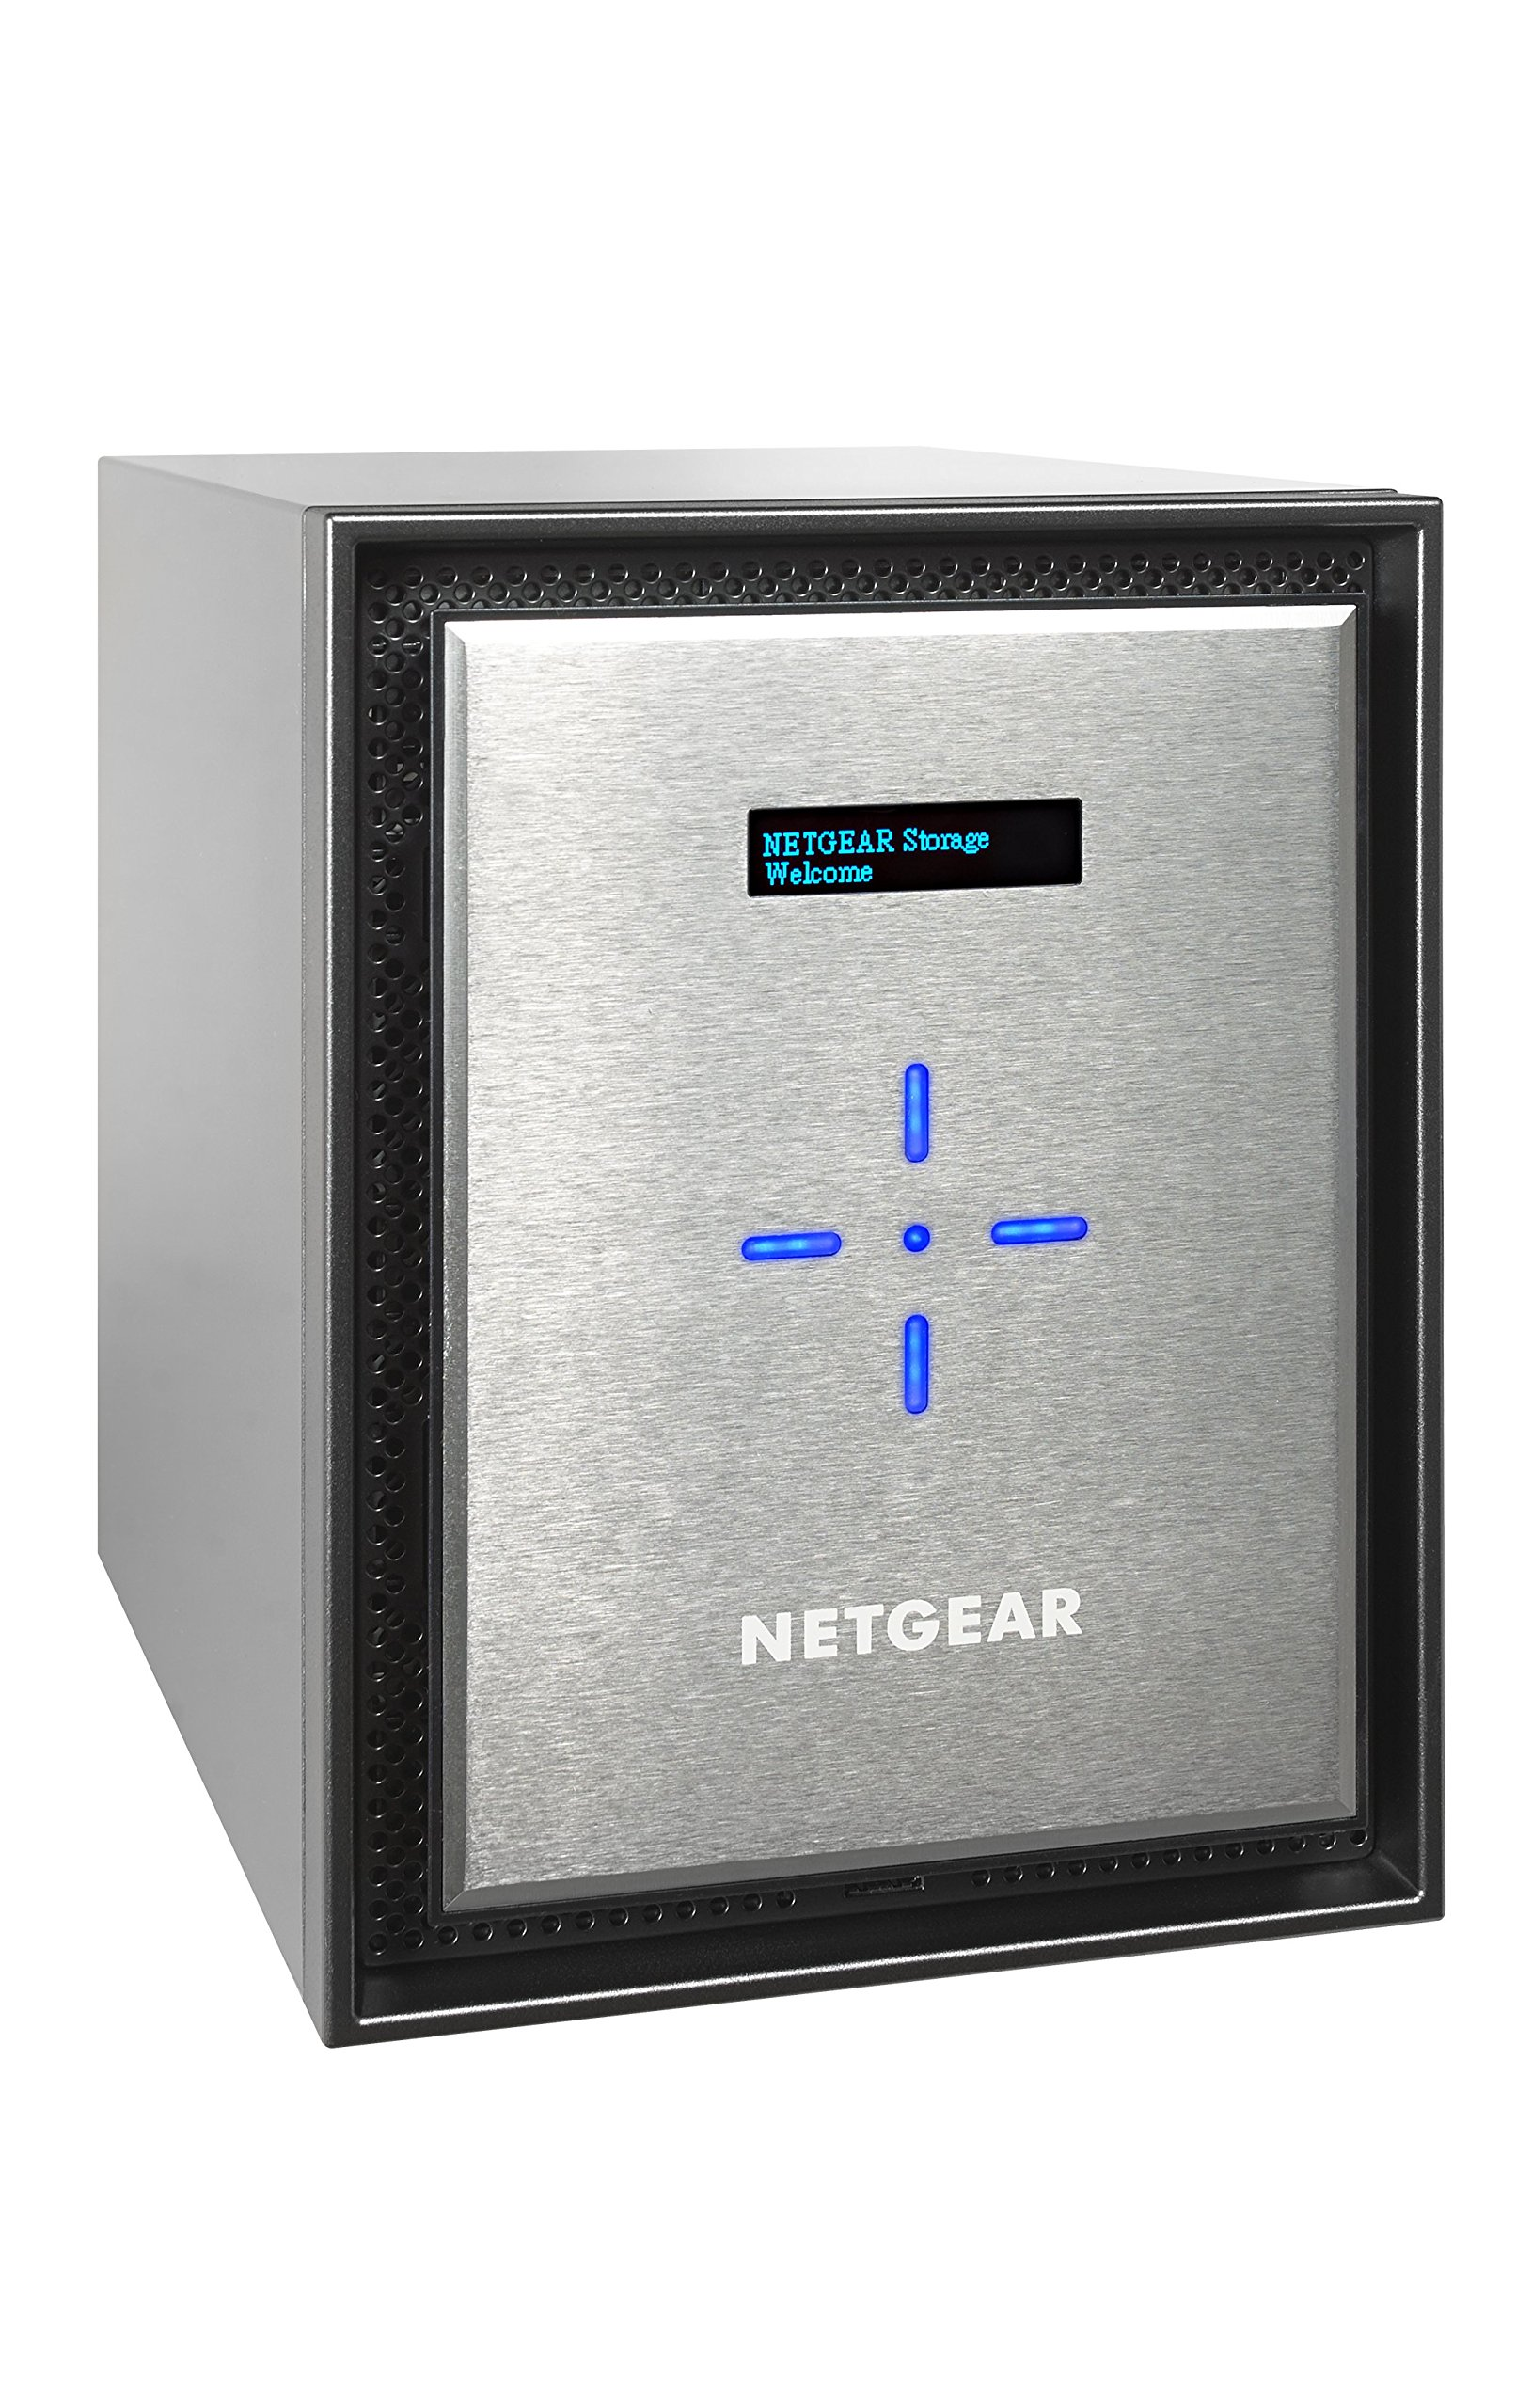 NETGEAR RN526XE6-100NES ReadyNAS 6 Bay 36TB Enterprise Premium Performance NAS, 60TB Capacity Network Attached Storage, Intel 2.2GHz Dual Core Processor, 4GB RAM